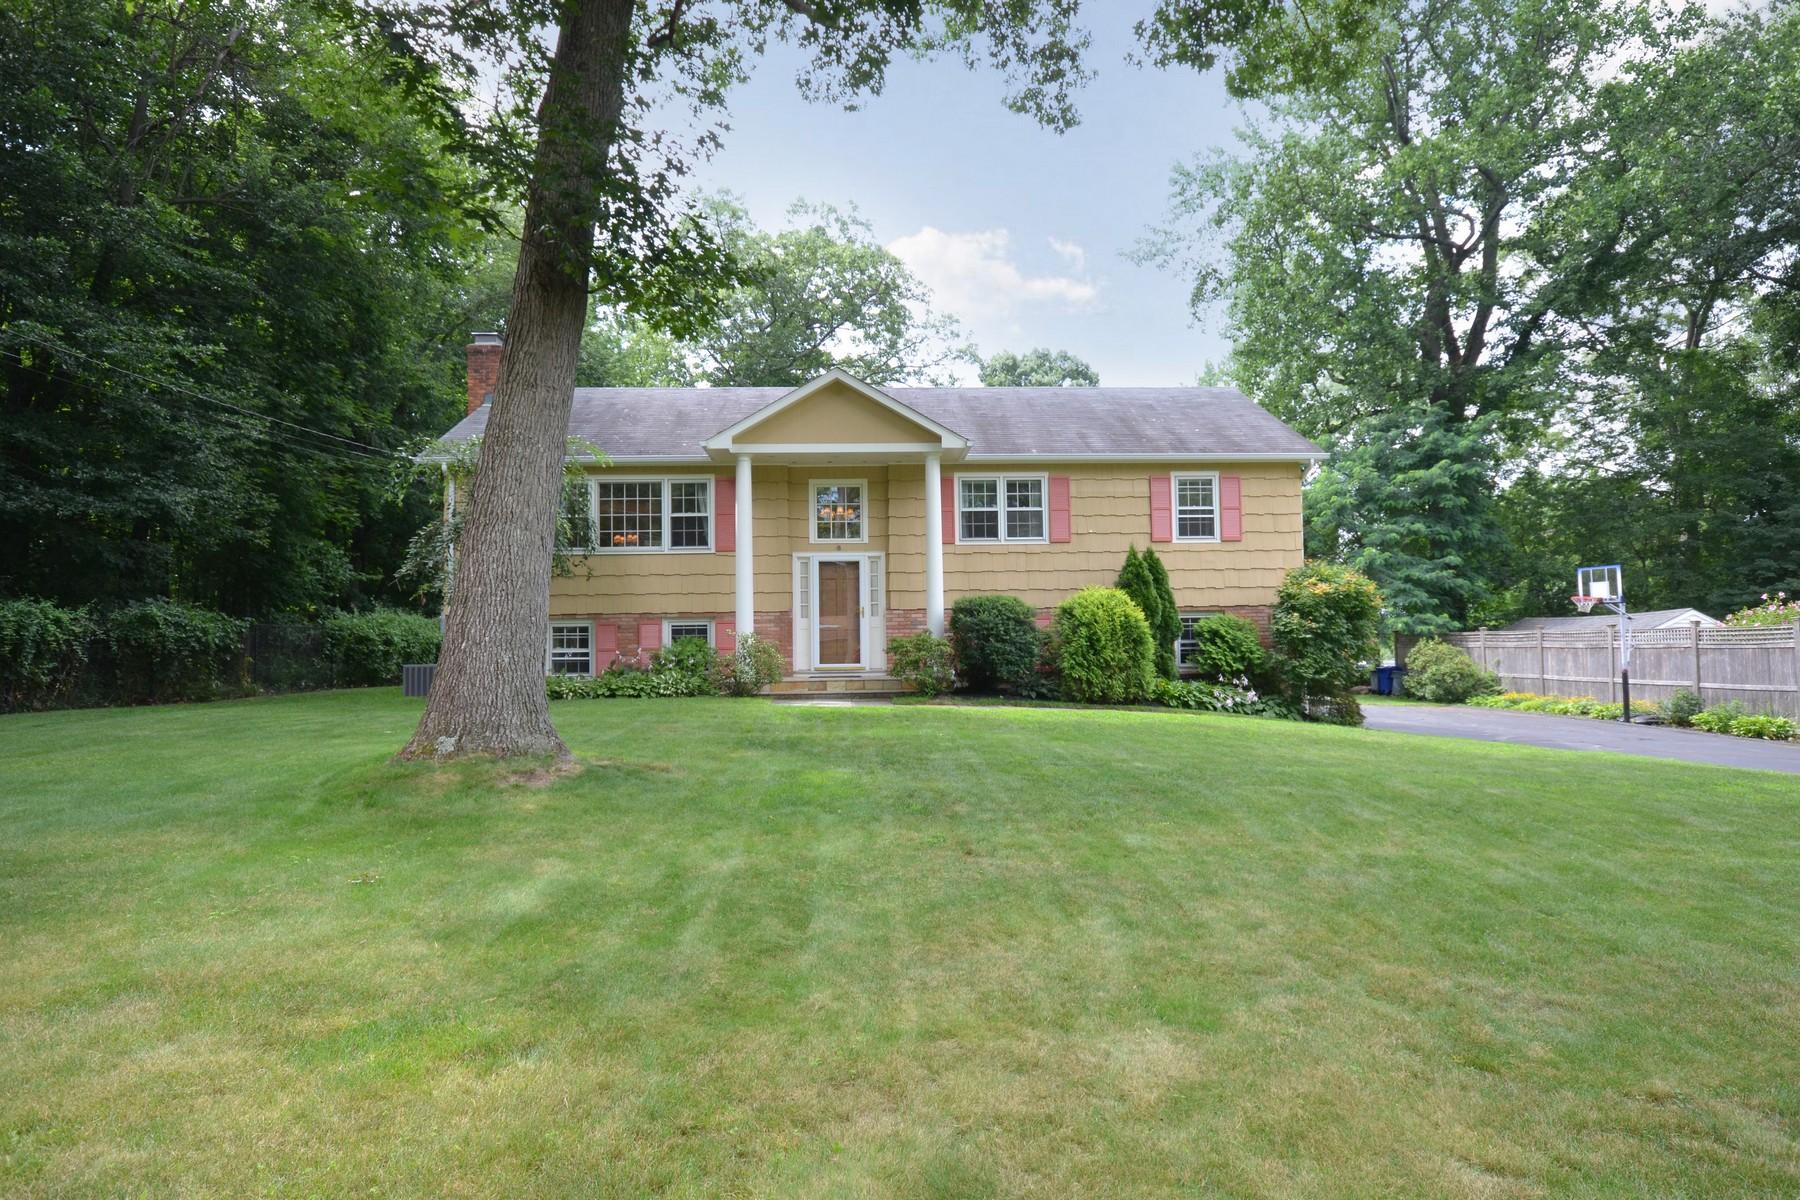 獨棟家庭住宅 為 出售 在 Warm & Inviting 7 Orchard Hill Road Norwalk, 康涅狄格州 06851 美國